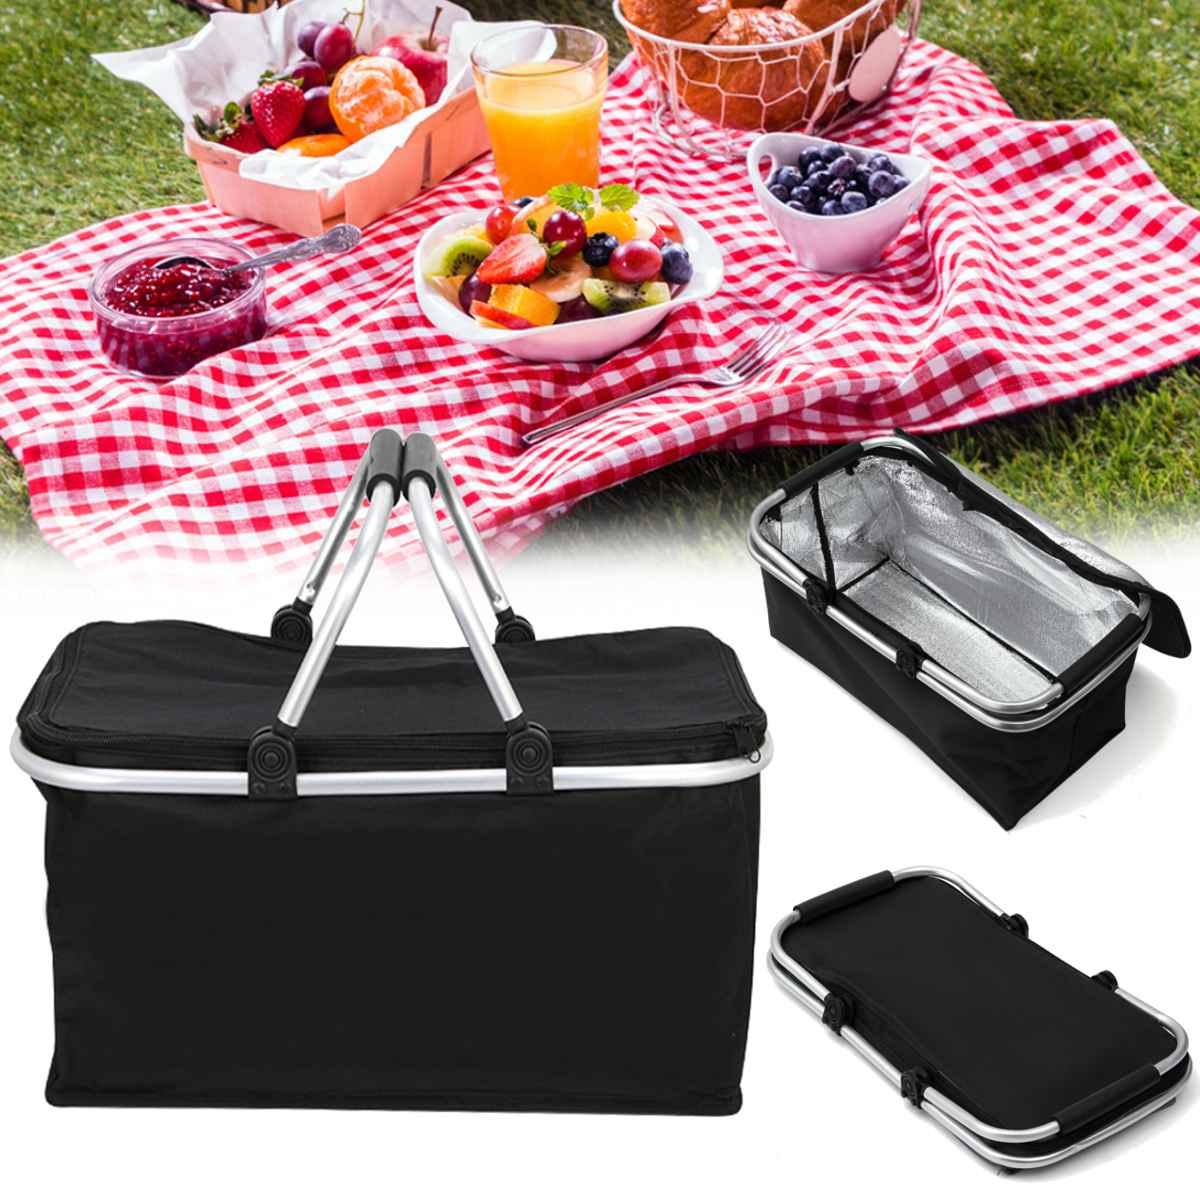 30L Black Folding Picnic Camping Bags Insulated Cooler Cool Hamper Storage Basket Bag Box Outdoor Picnic Bags